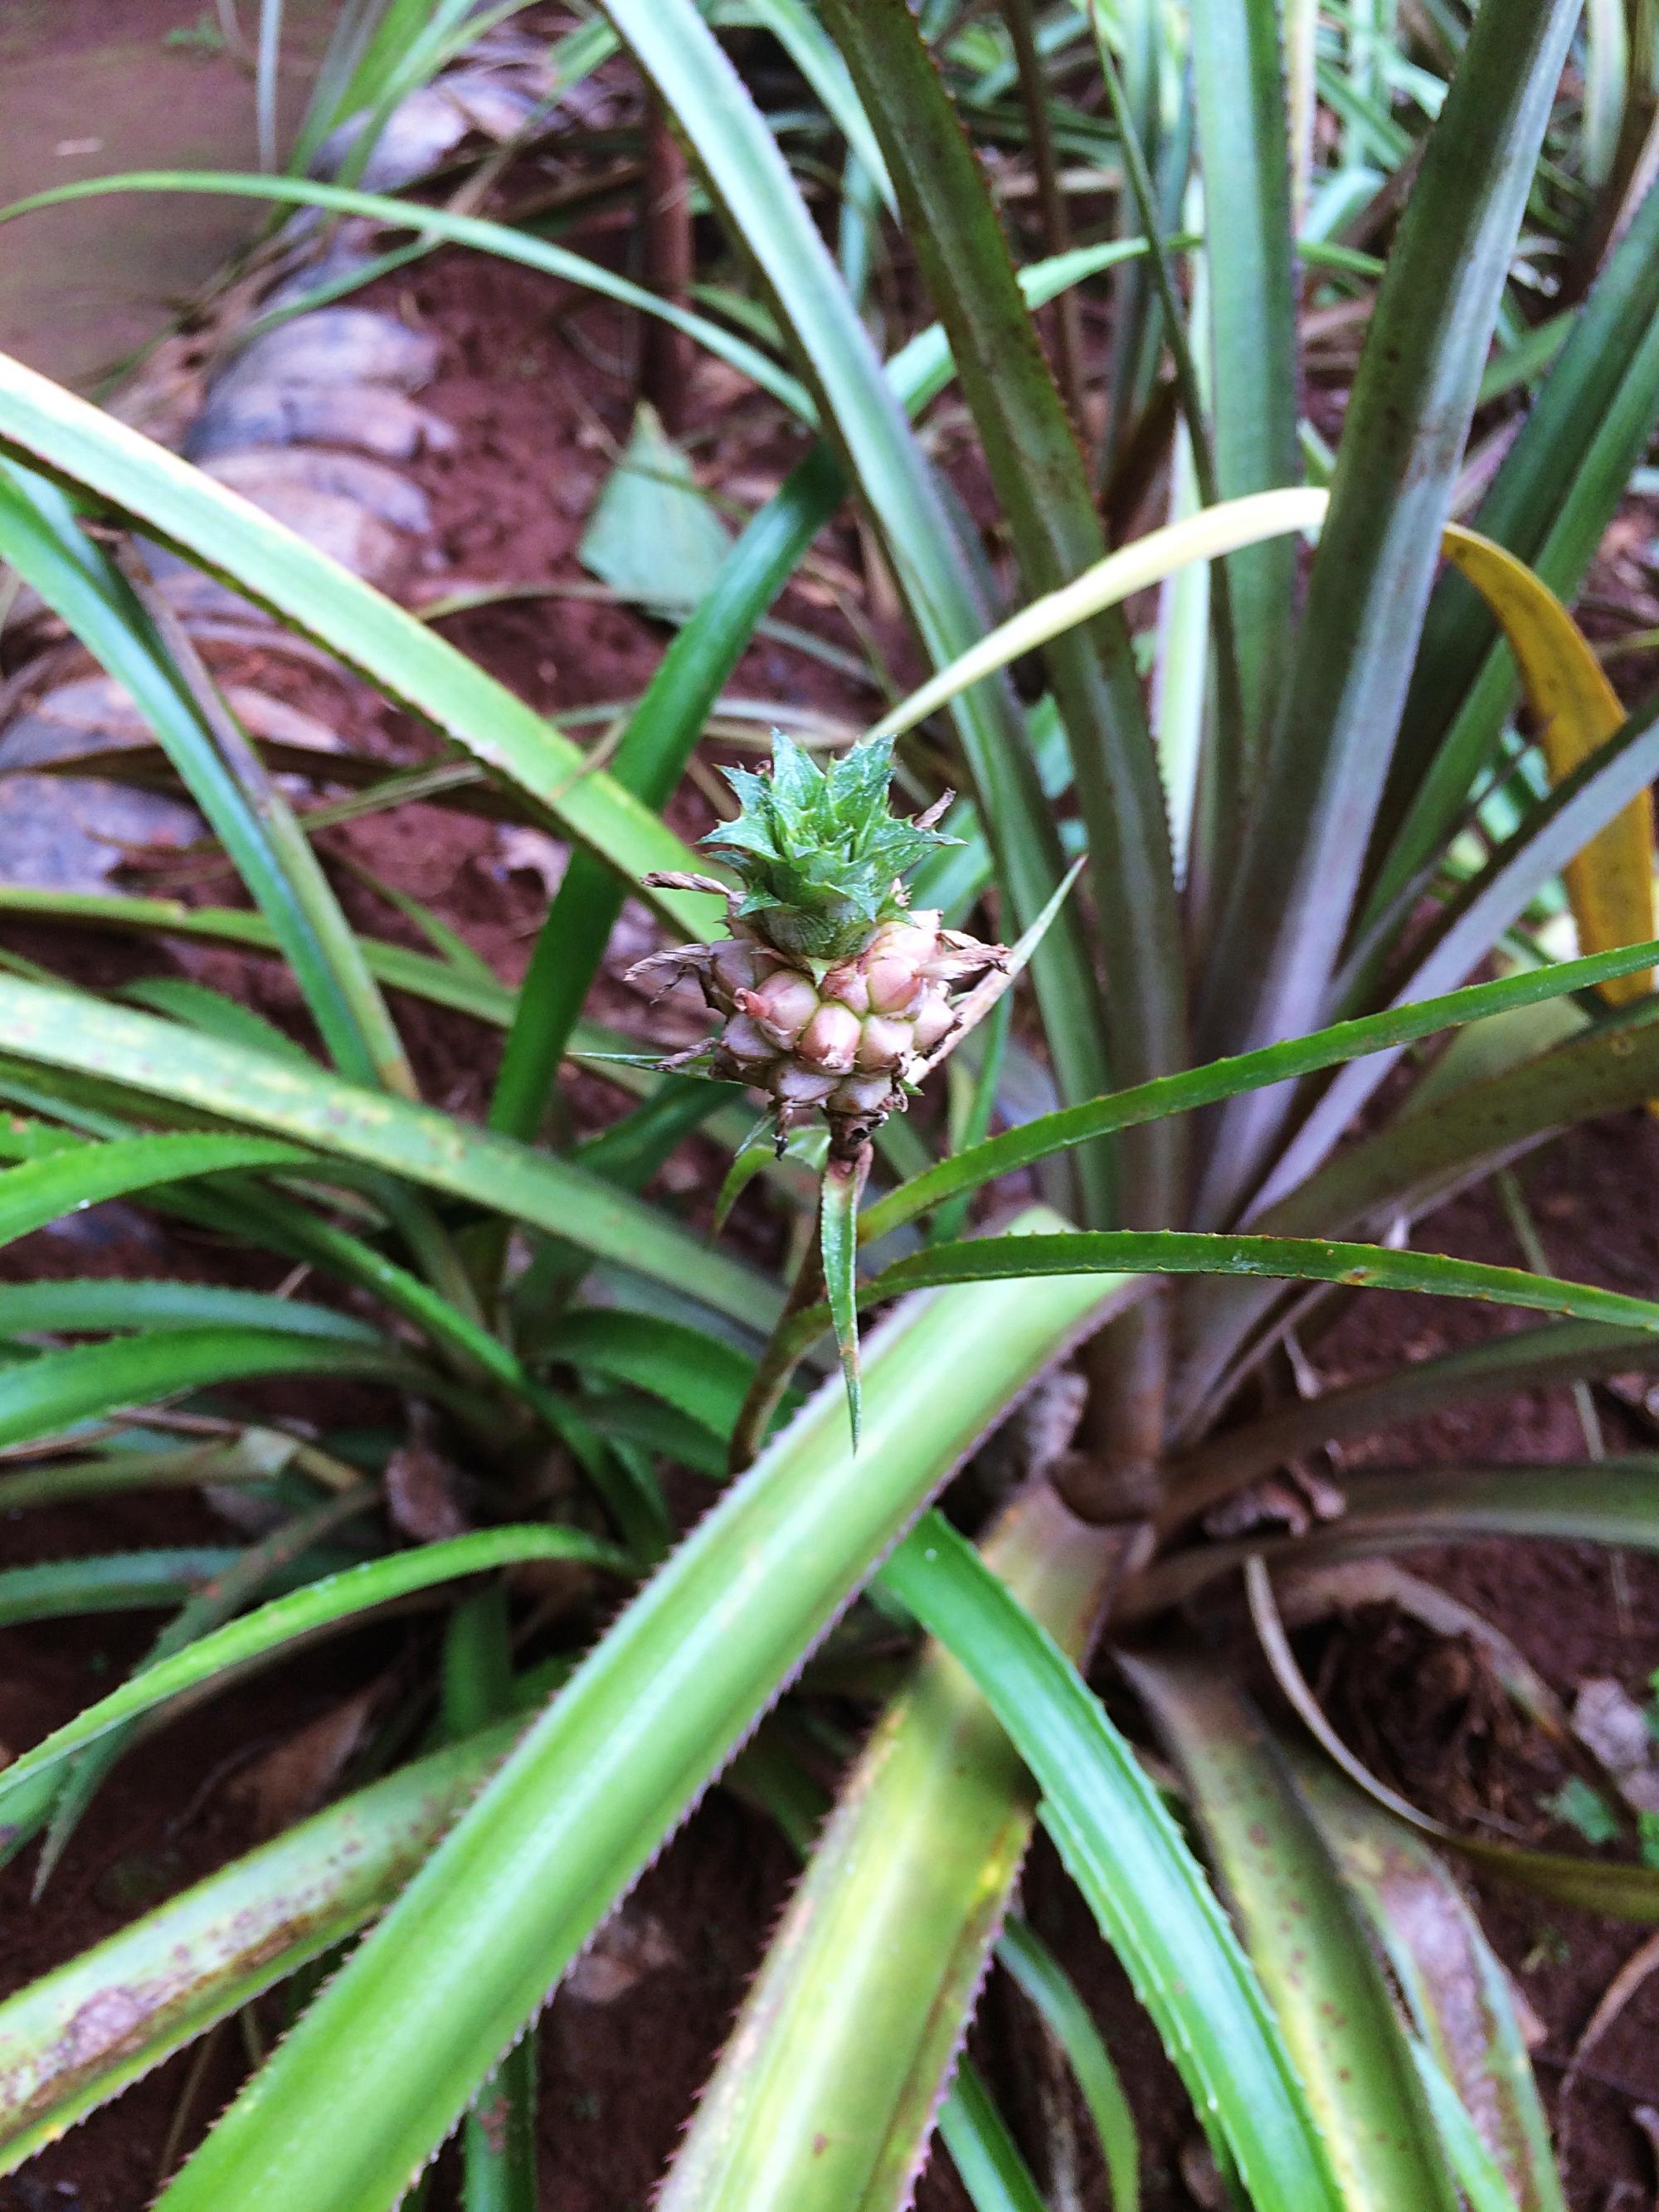 SpiceGarden Pineapple